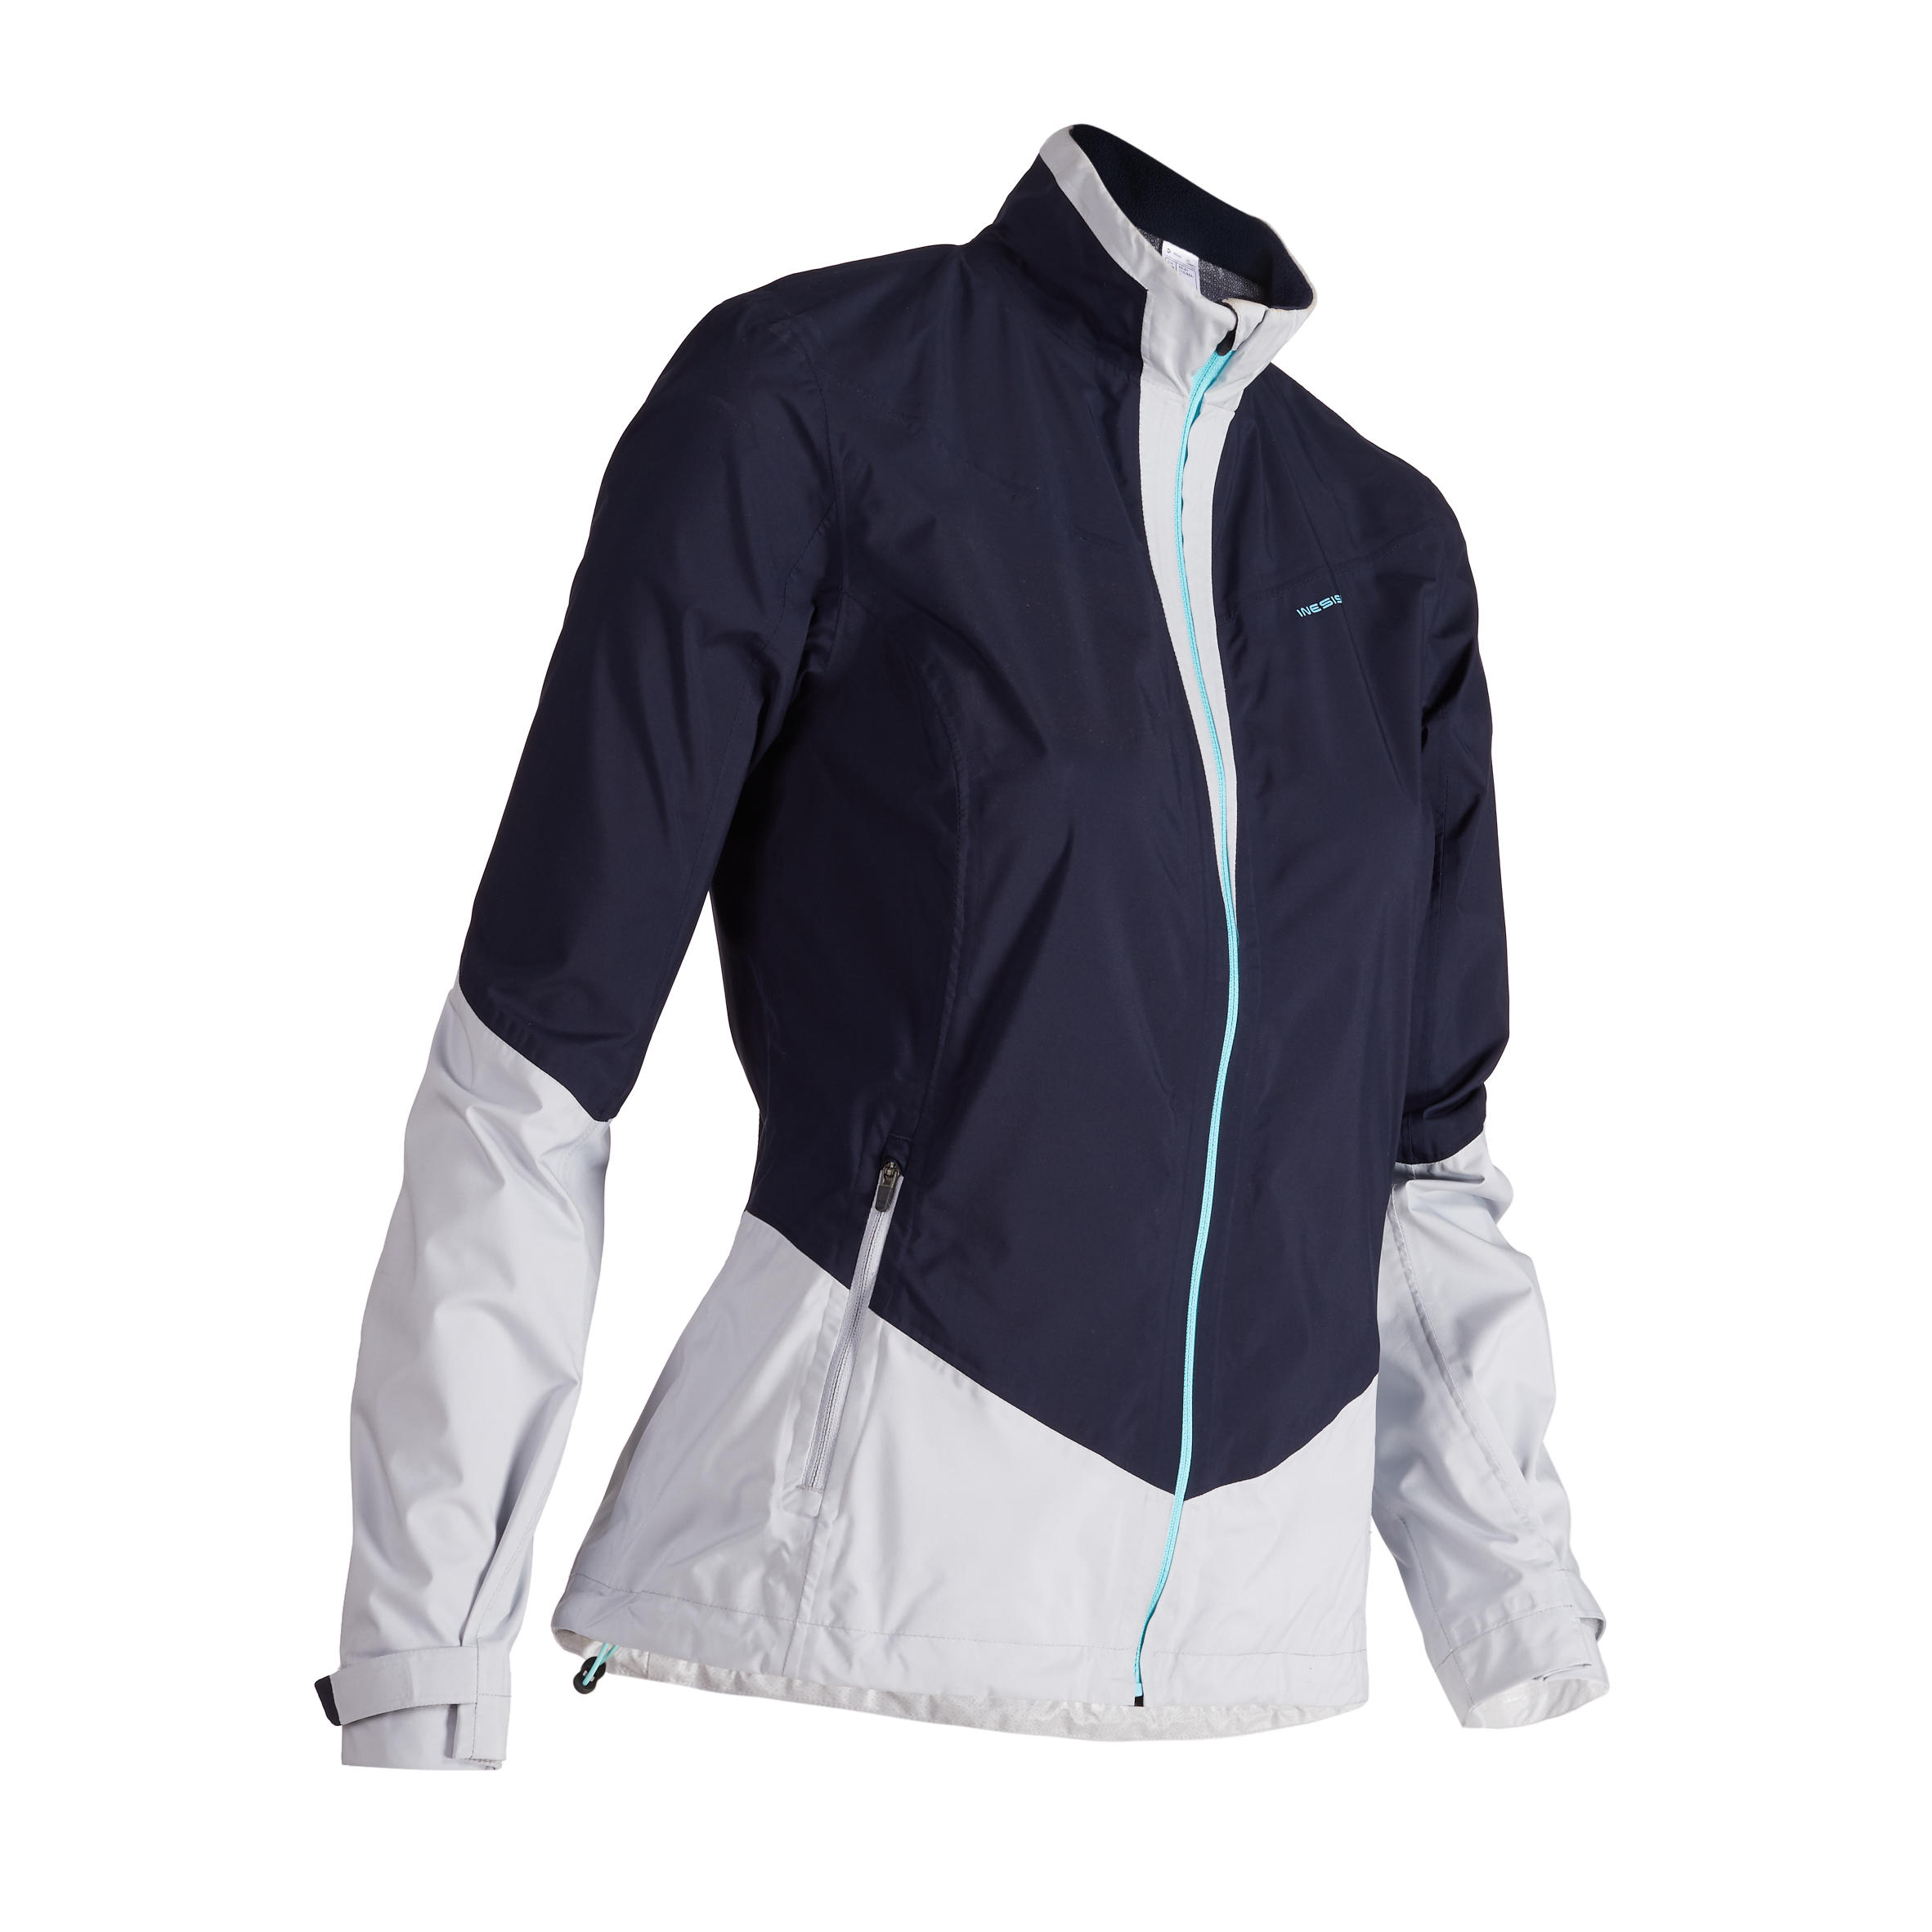 900 Women's Golf Rain Jacket - Navy Blue and Grey